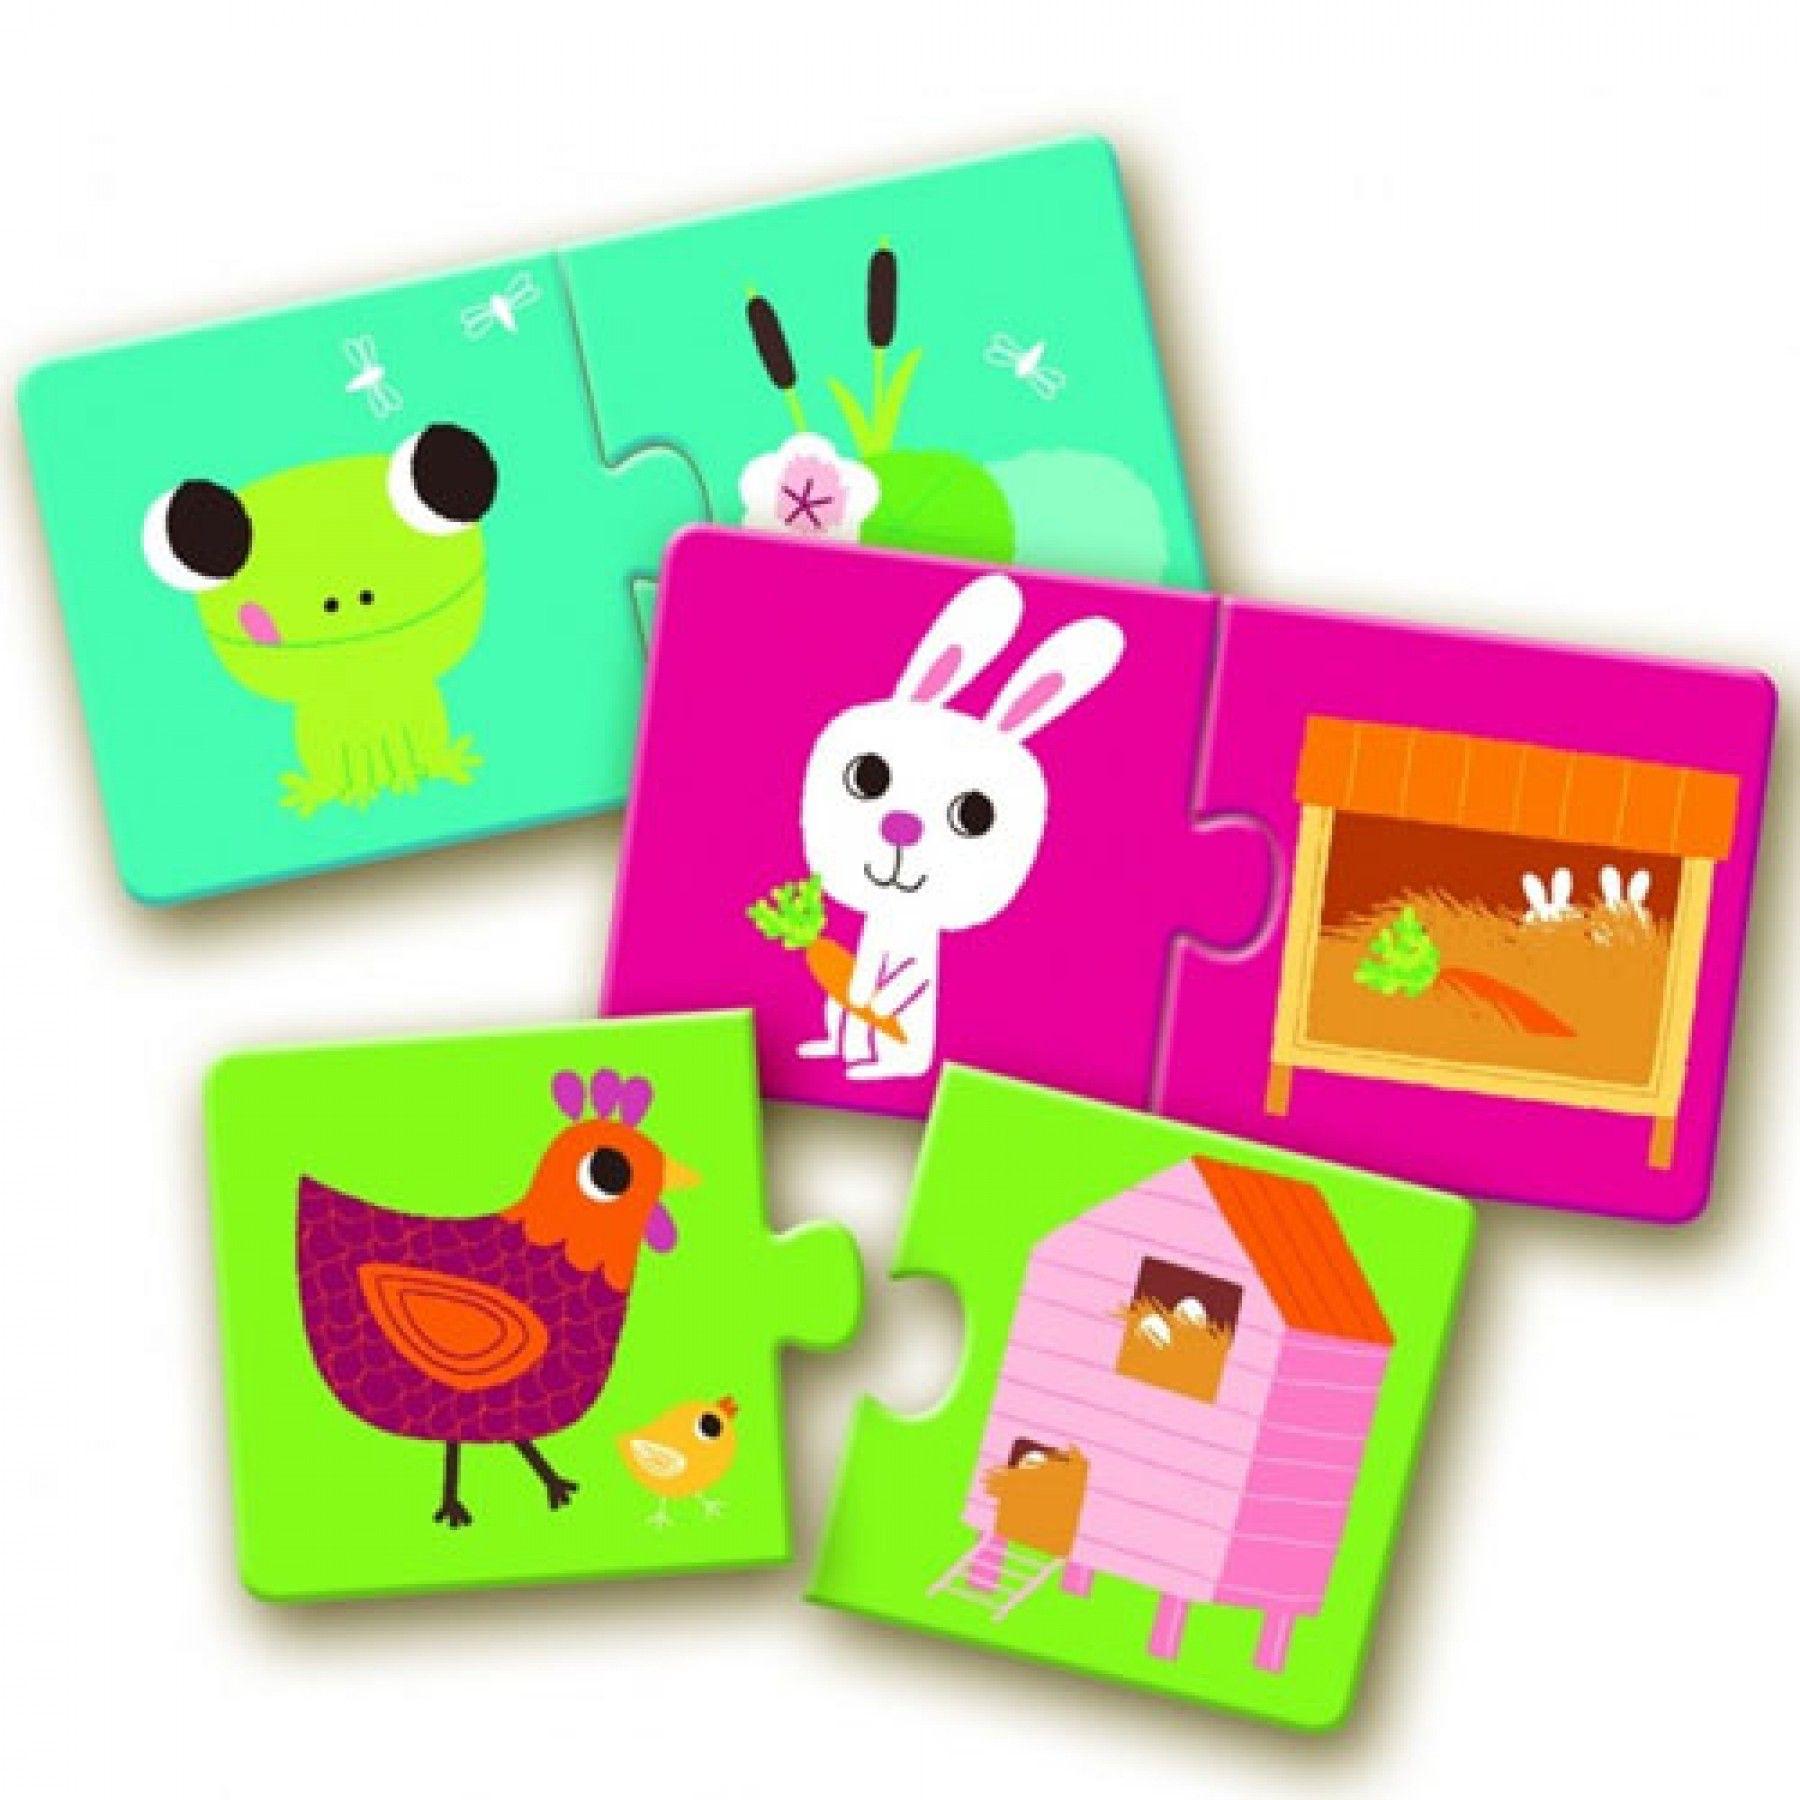 Djeco Djeco Duo puzzel - Leefruimte - 10 puzzels 2y+